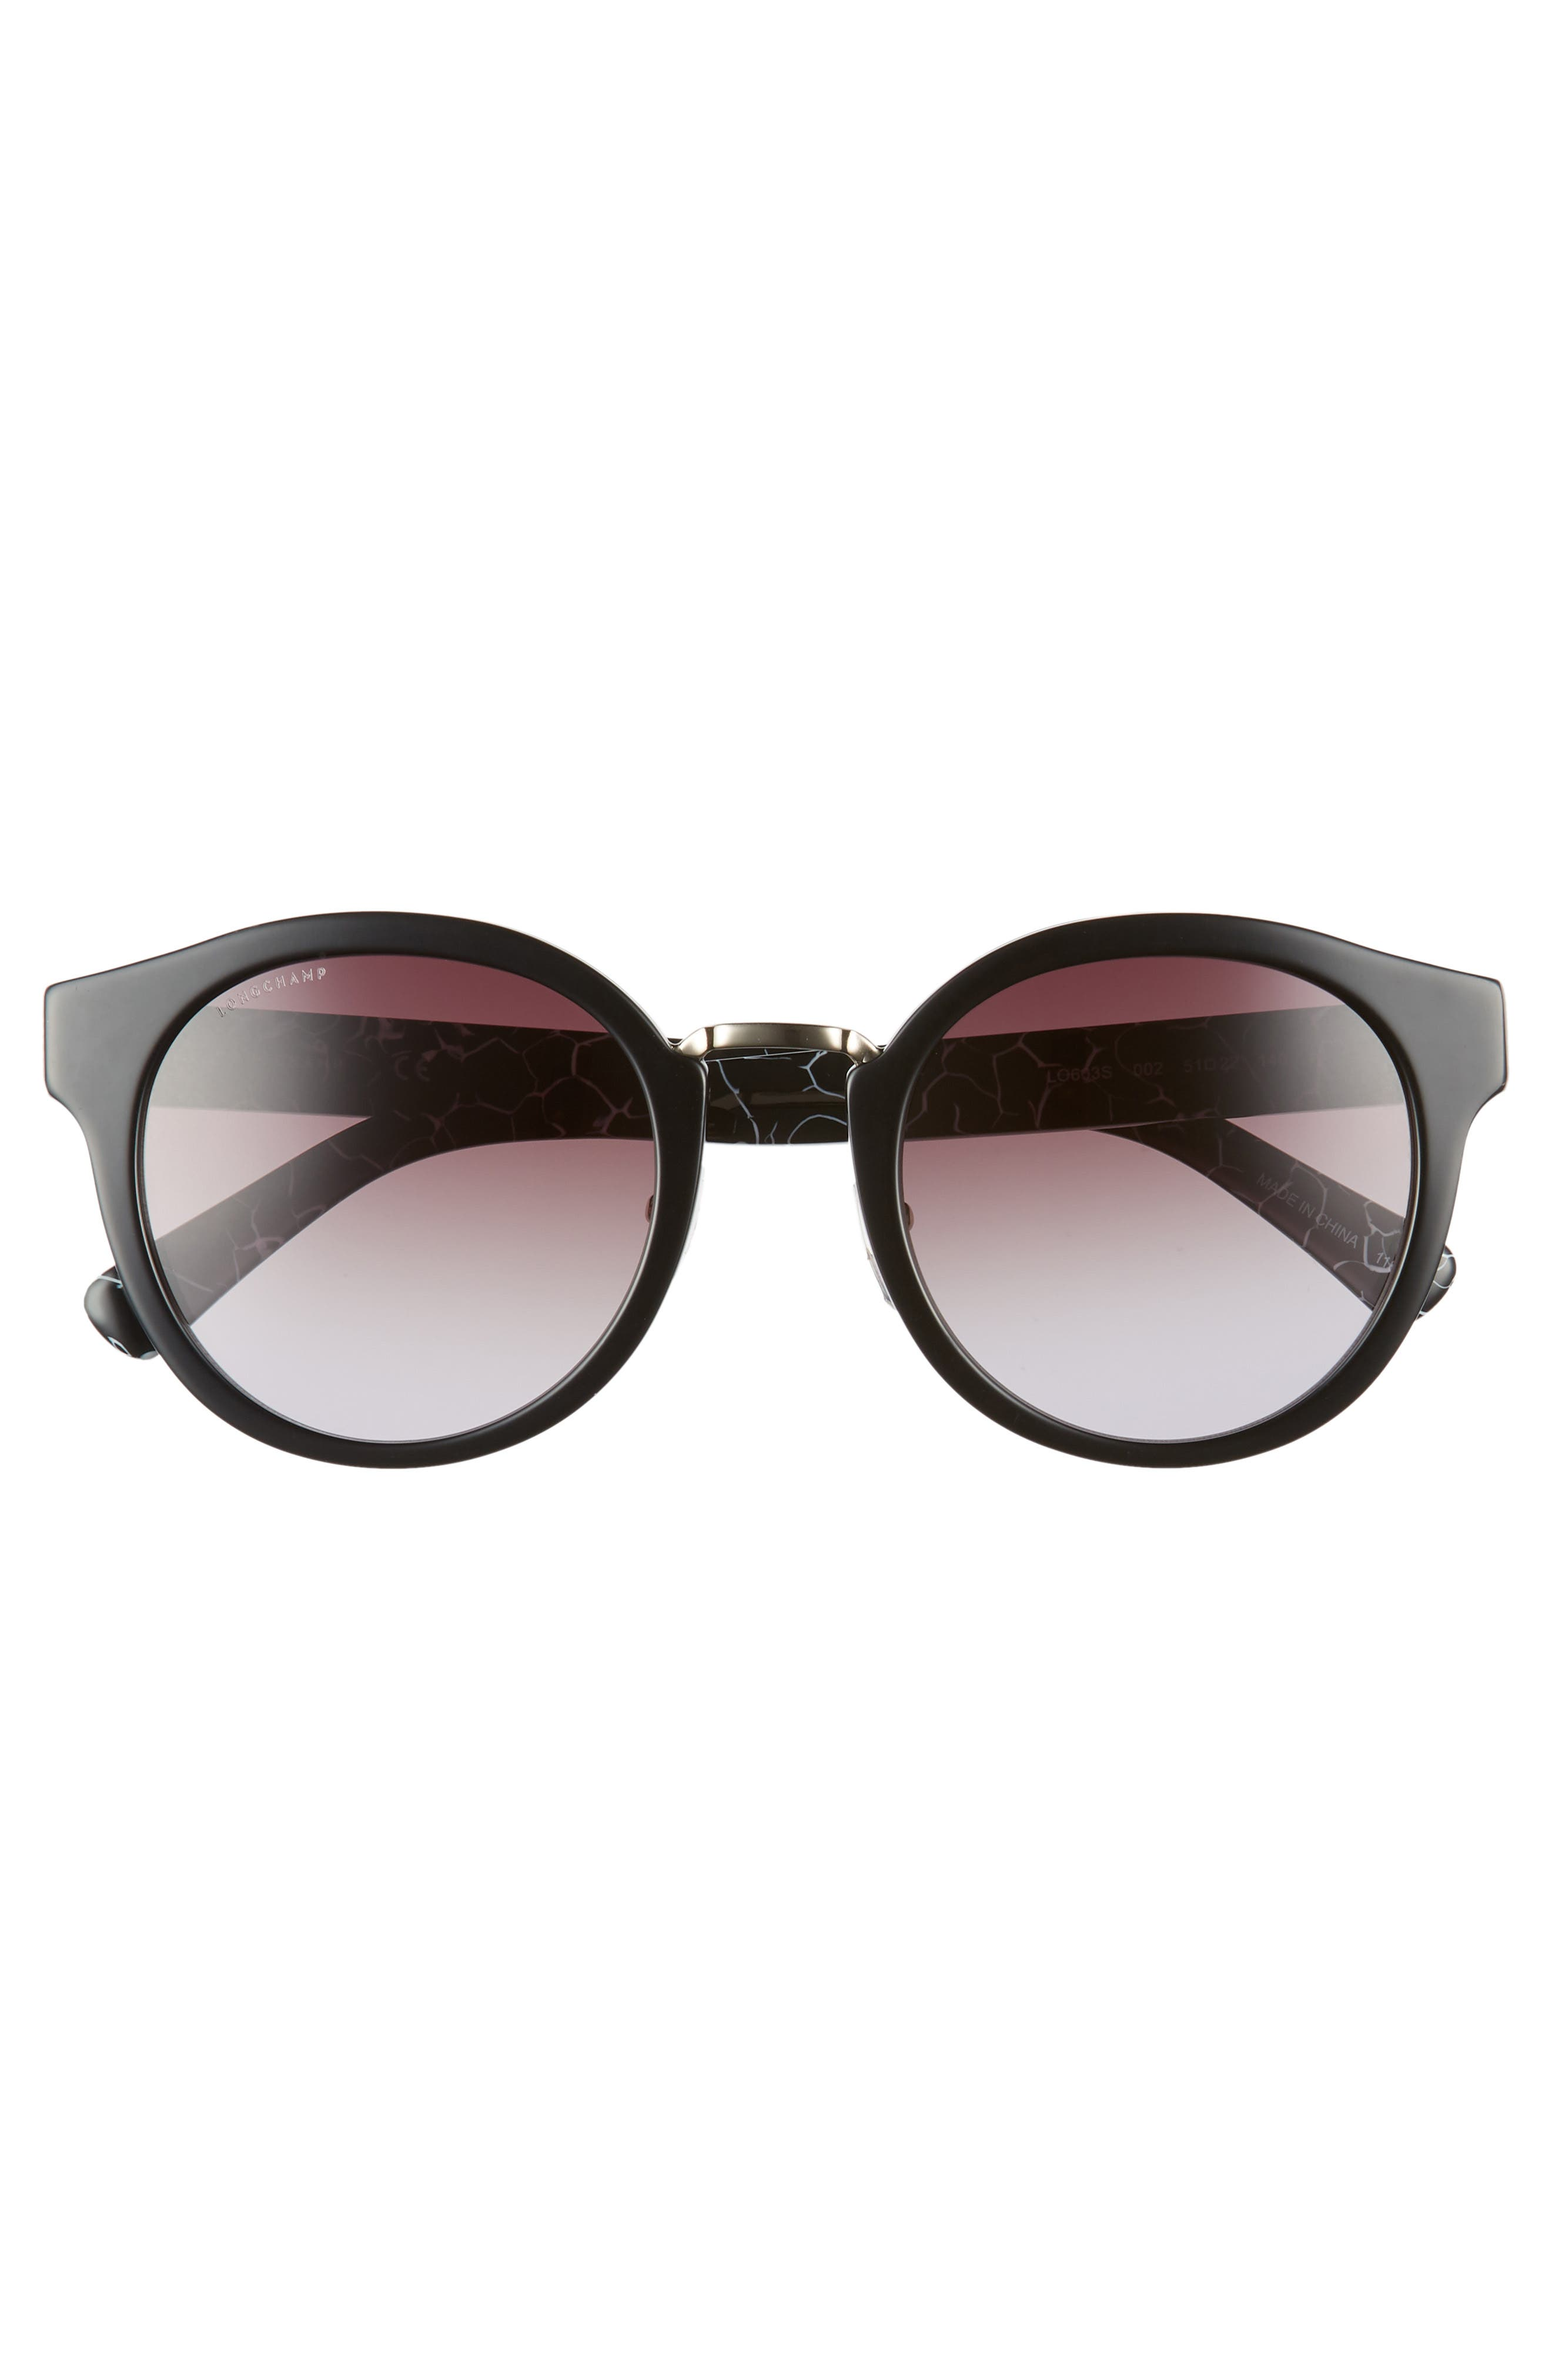 51mm Round Sunglasses,                             Alternate thumbnail 3, color,                             MARBLE BLACK